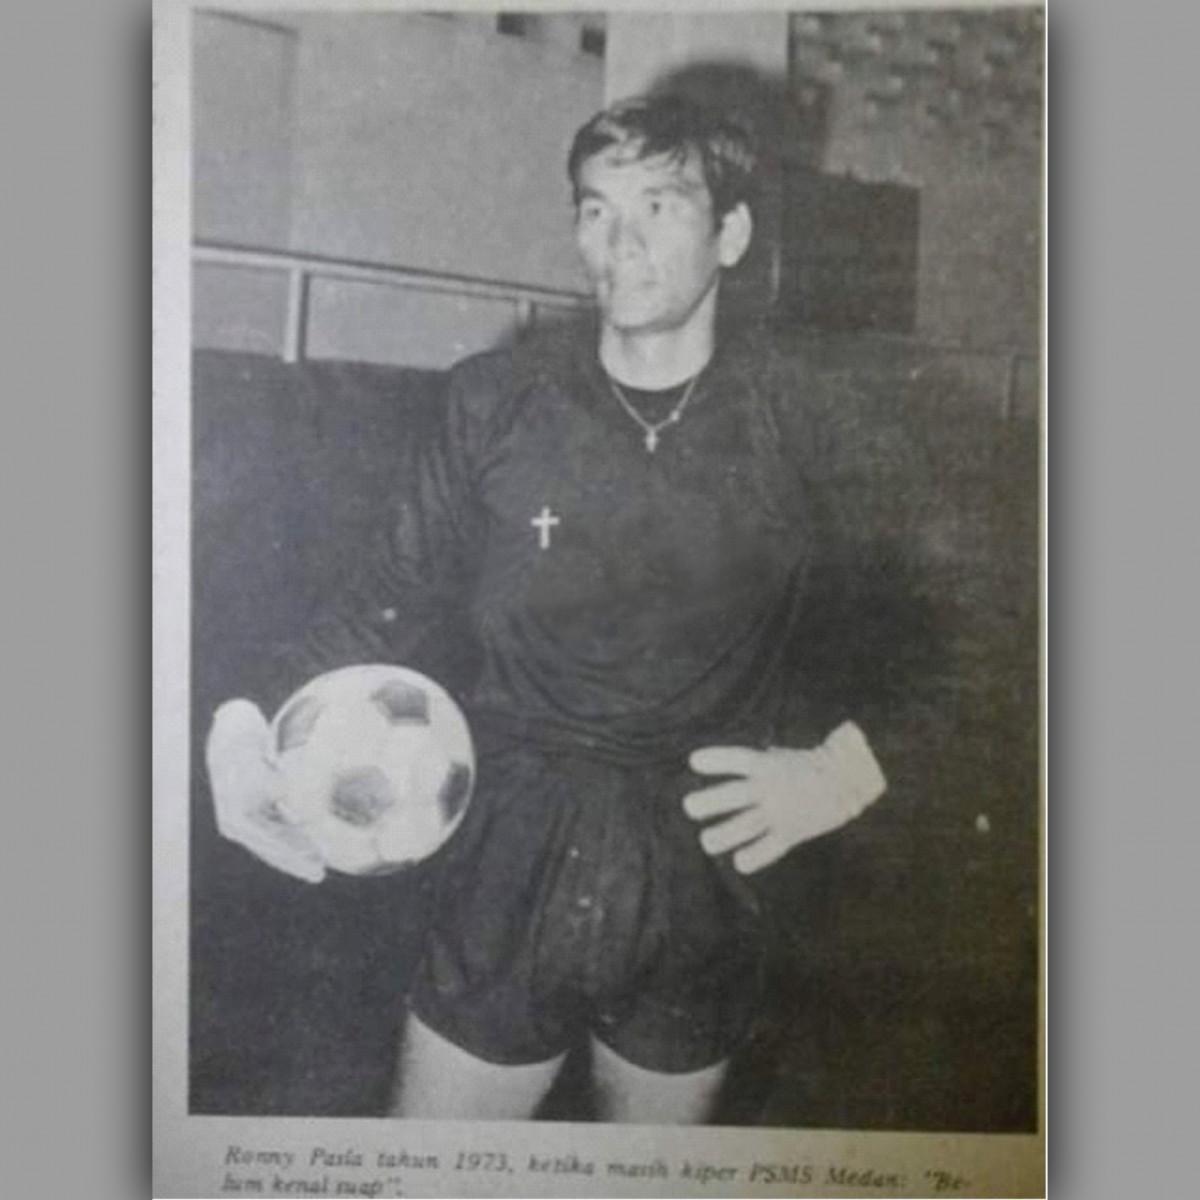 Mengenal Ronny Pasla, Legenda Kiper Timnas yang Pernah Gagalkan Penalti Pele